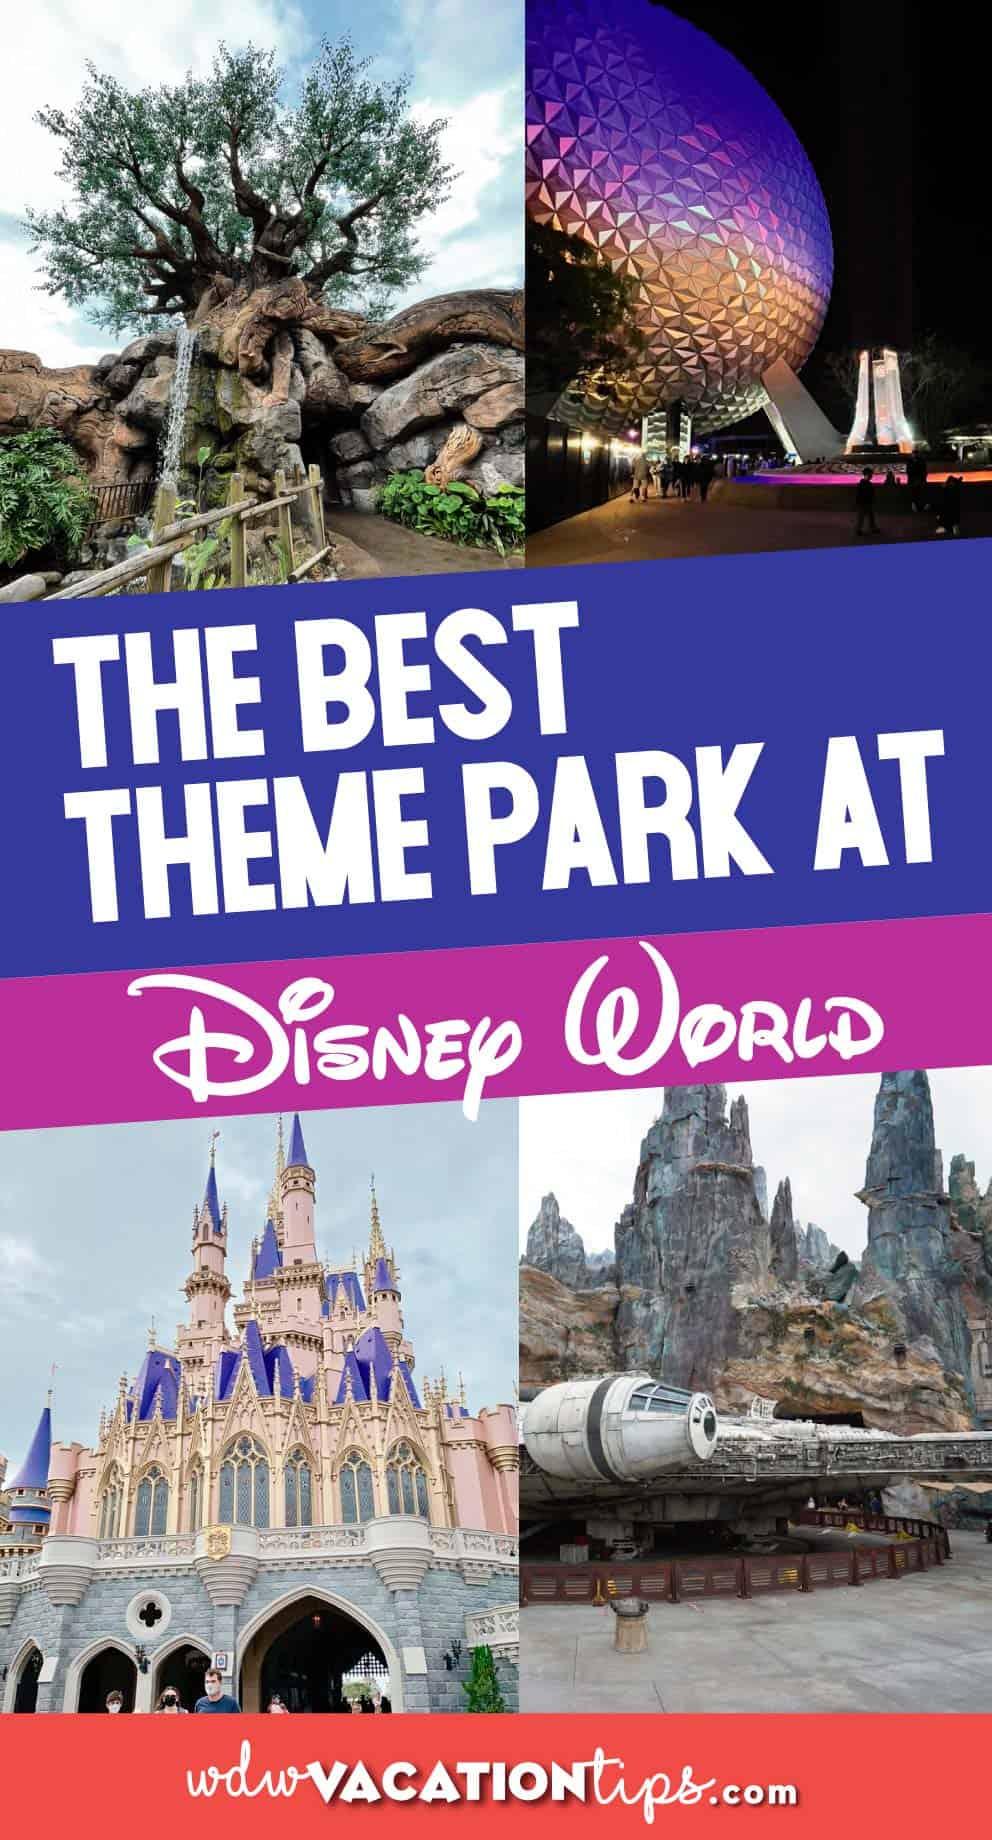 Best Theme Park at Walt Disney World